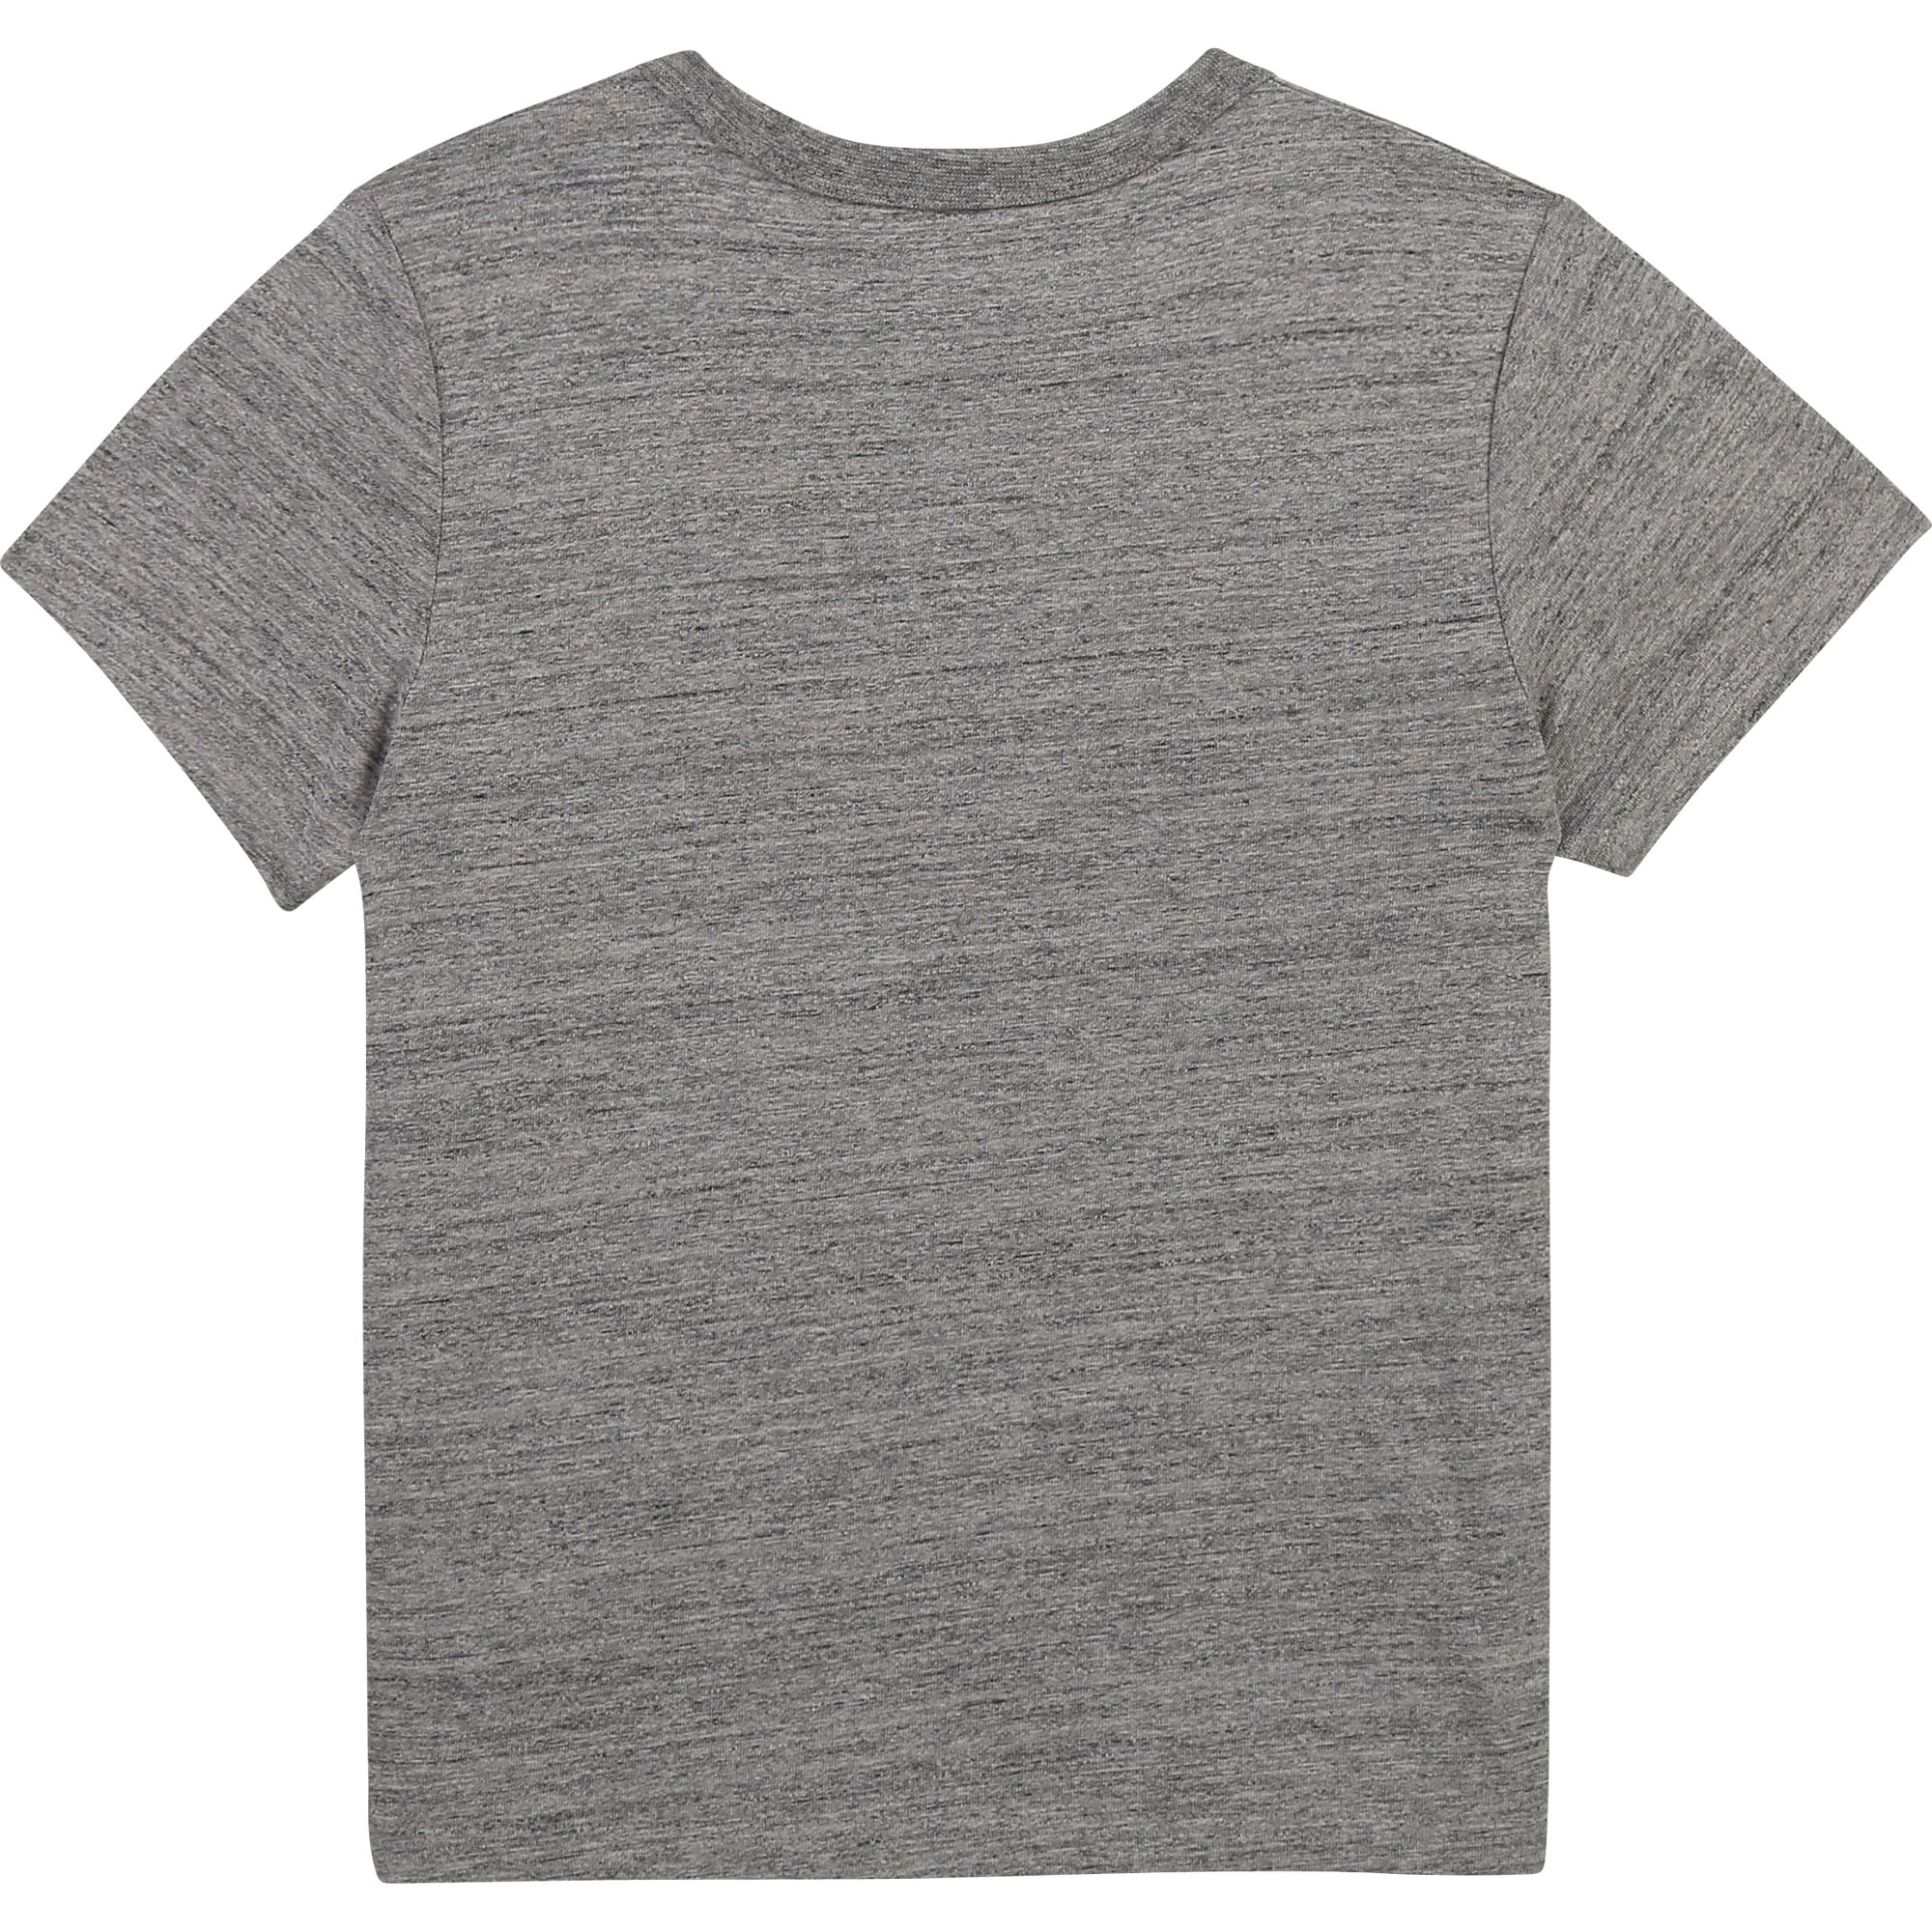 Short-sleeved T-shirt THE MARC JACOBS for GIRL